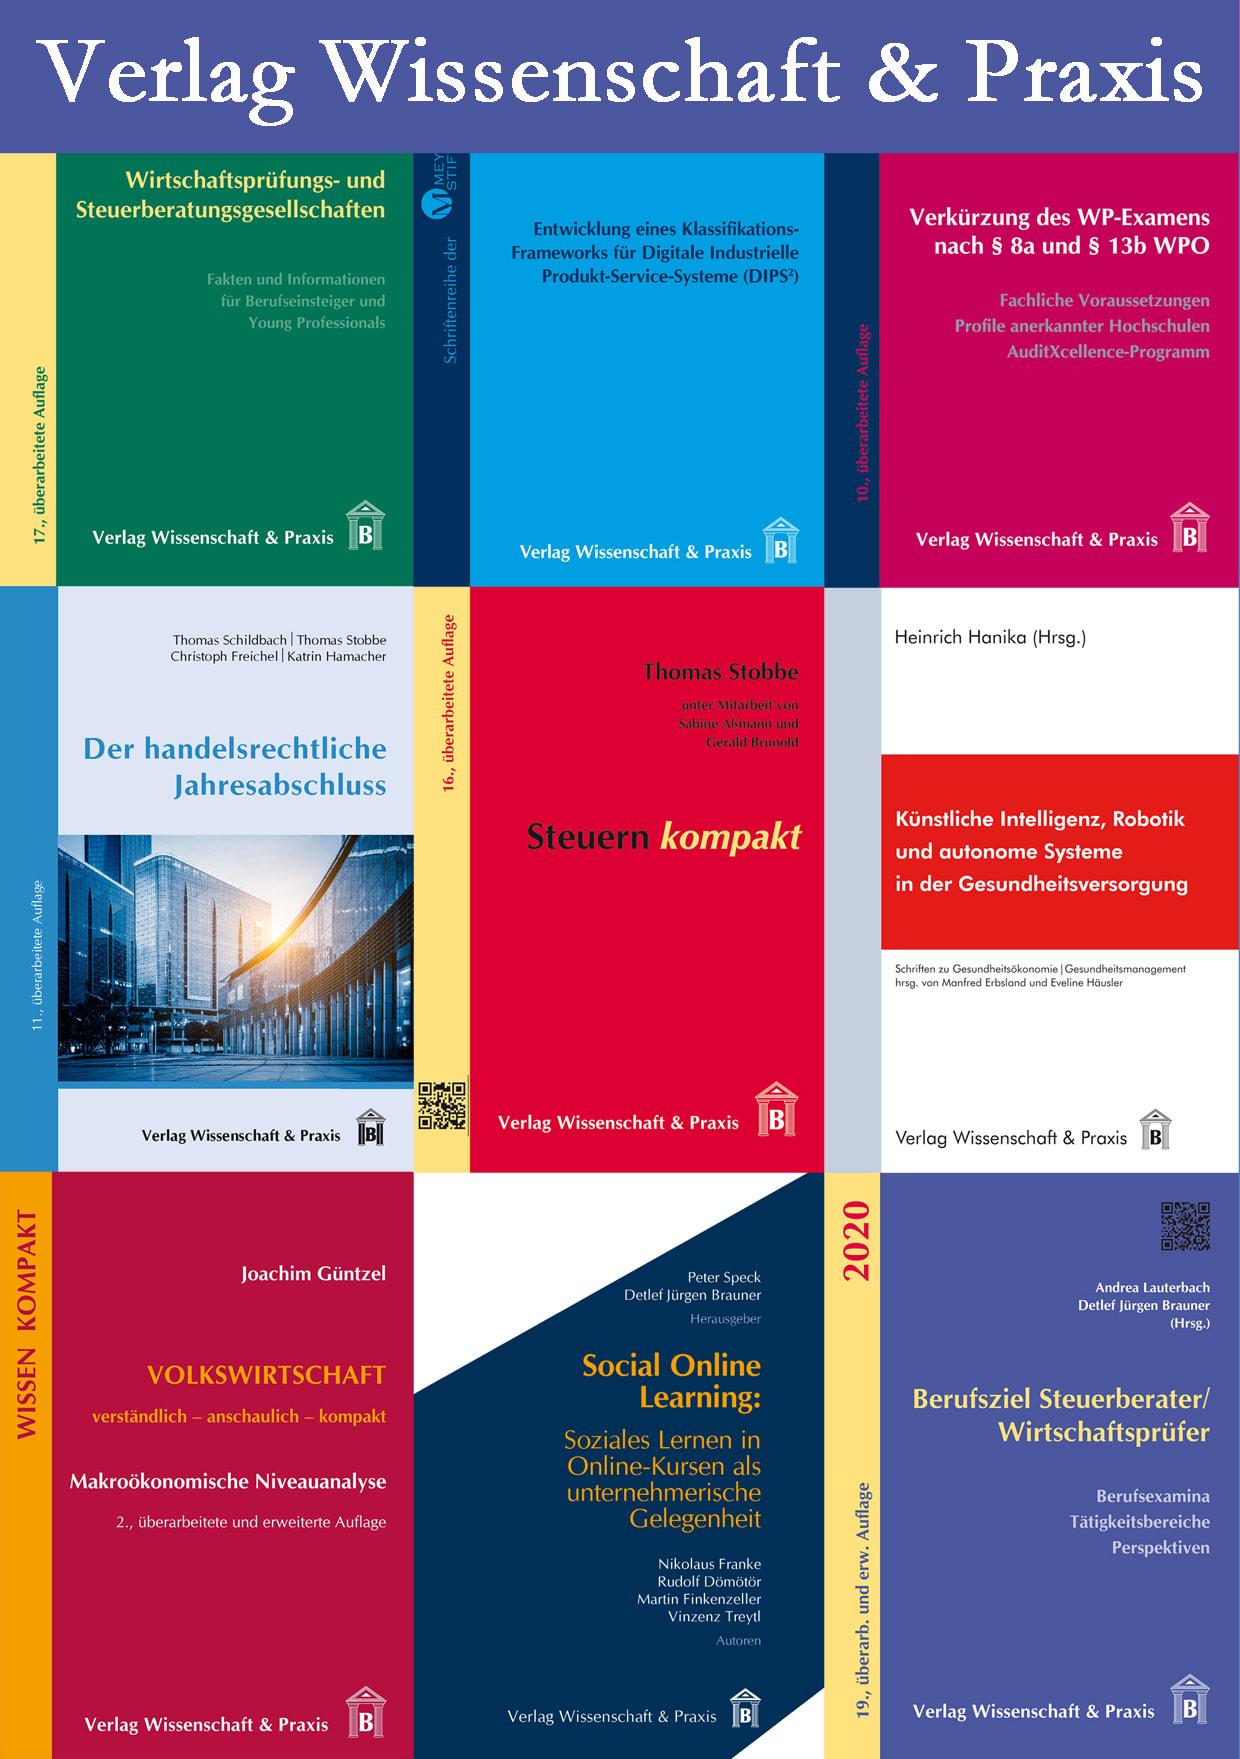 Verlag Wissenschaft & Praxis